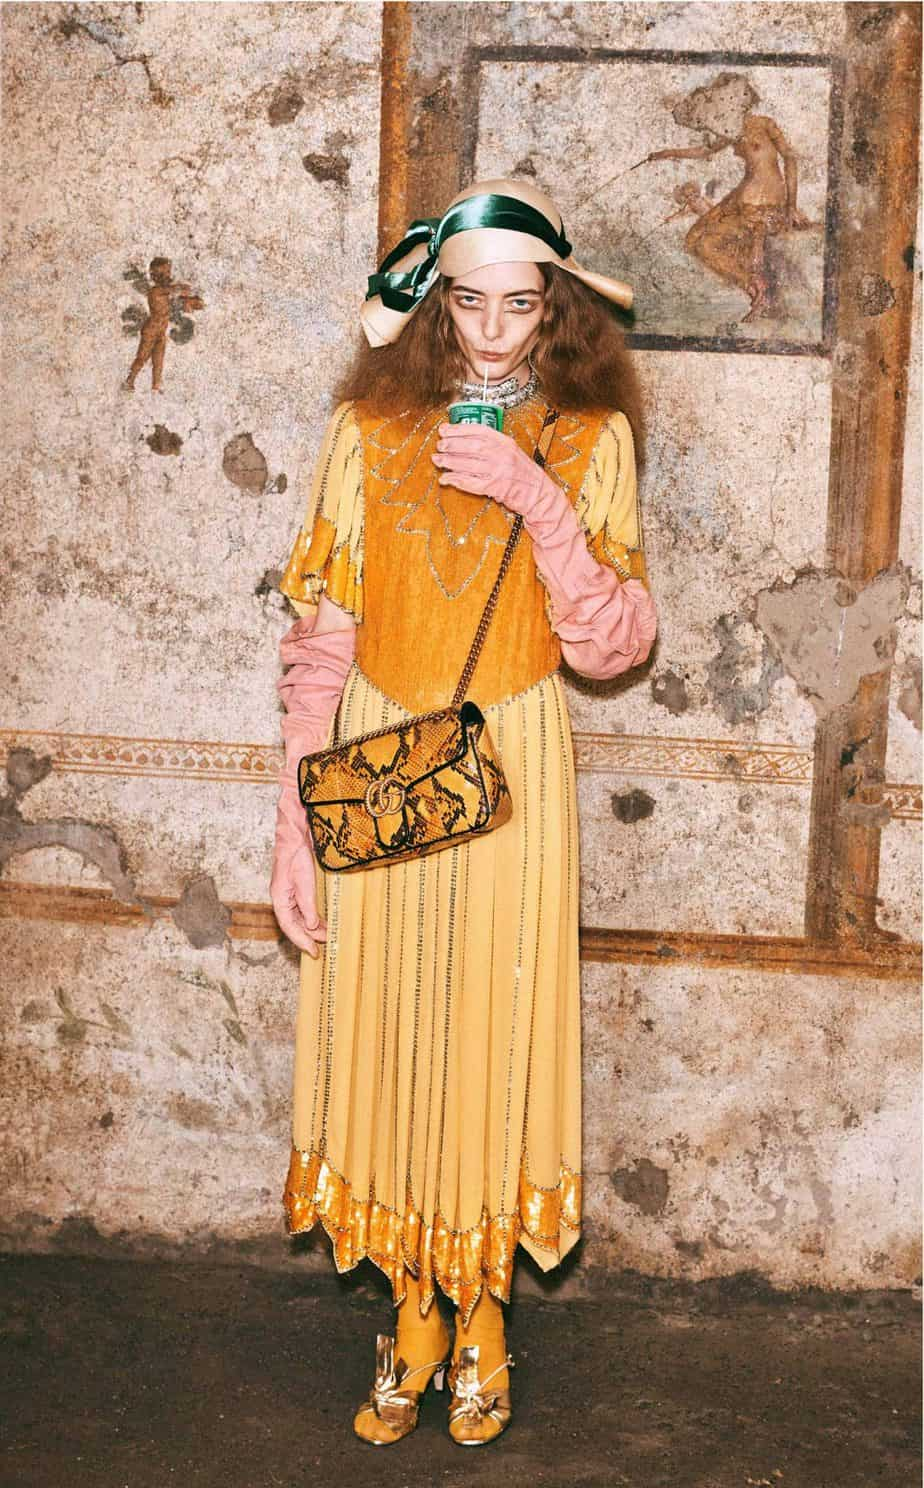 GUCCI, FALL 2019. WOMEN'S FASHION, Photographer Harmony Korine, Art Director, Christopher Simmonds - 95